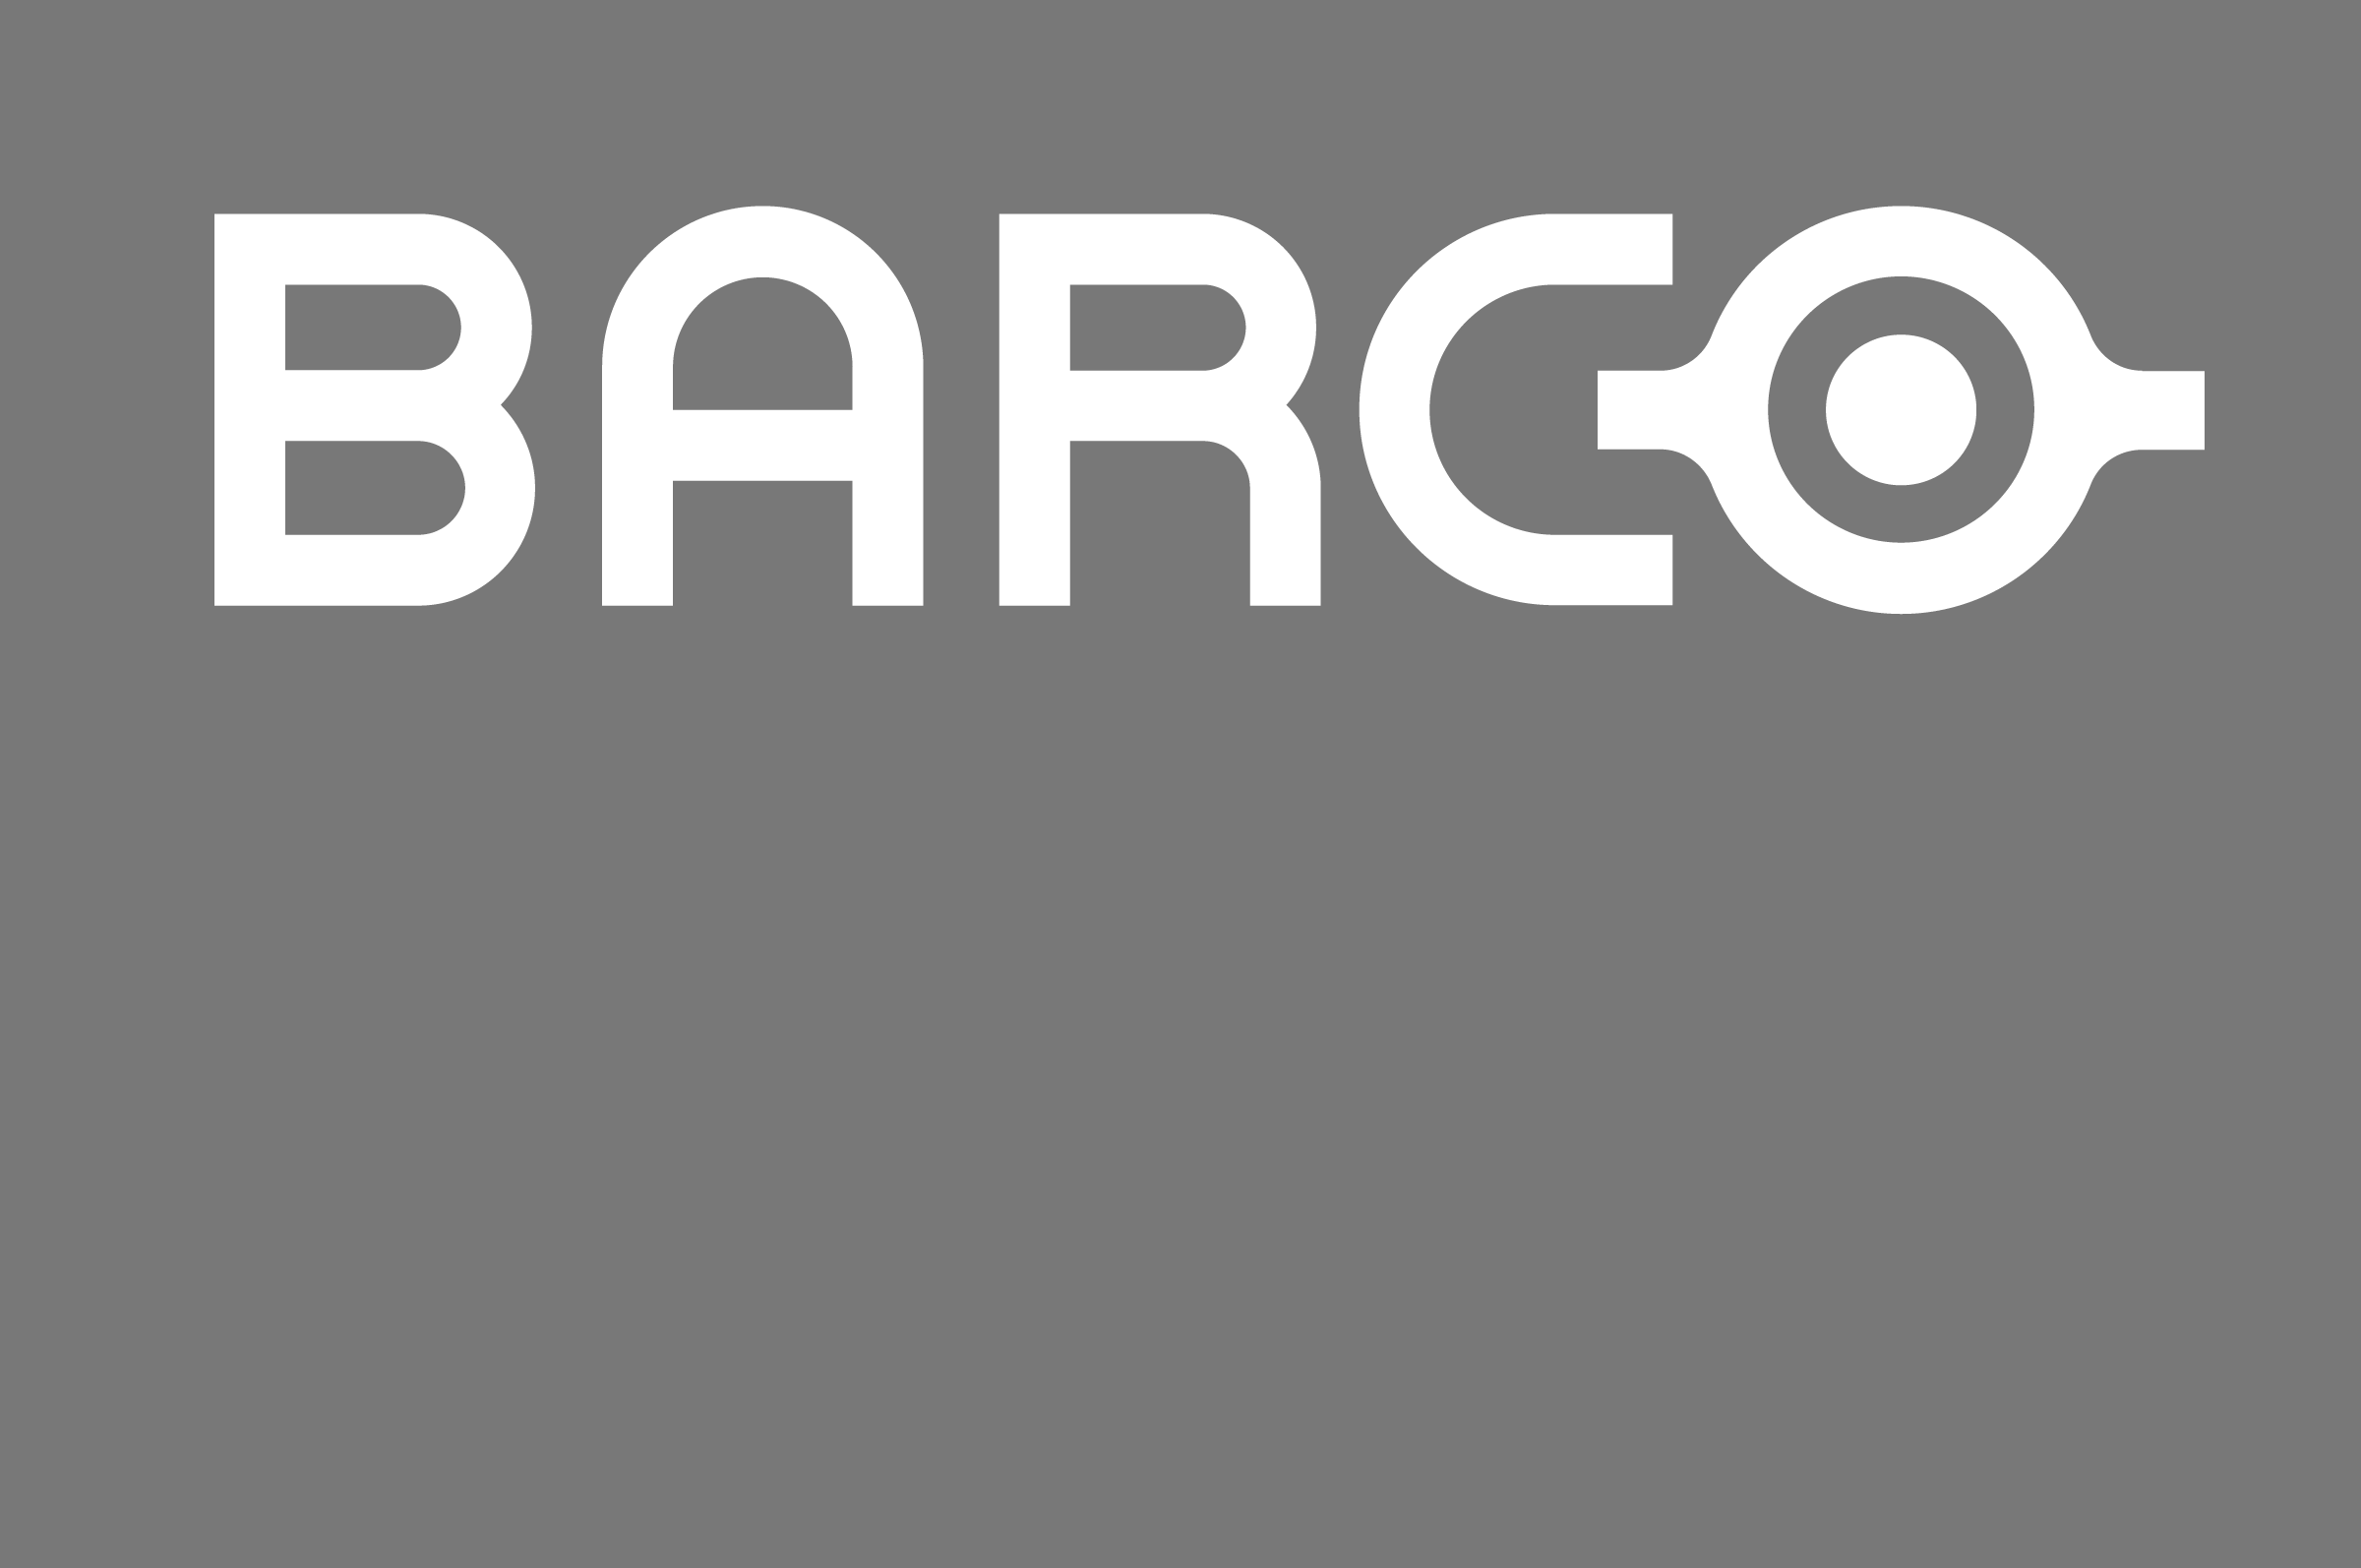 BARCO Logo PNG Transparent & SVG Vector.